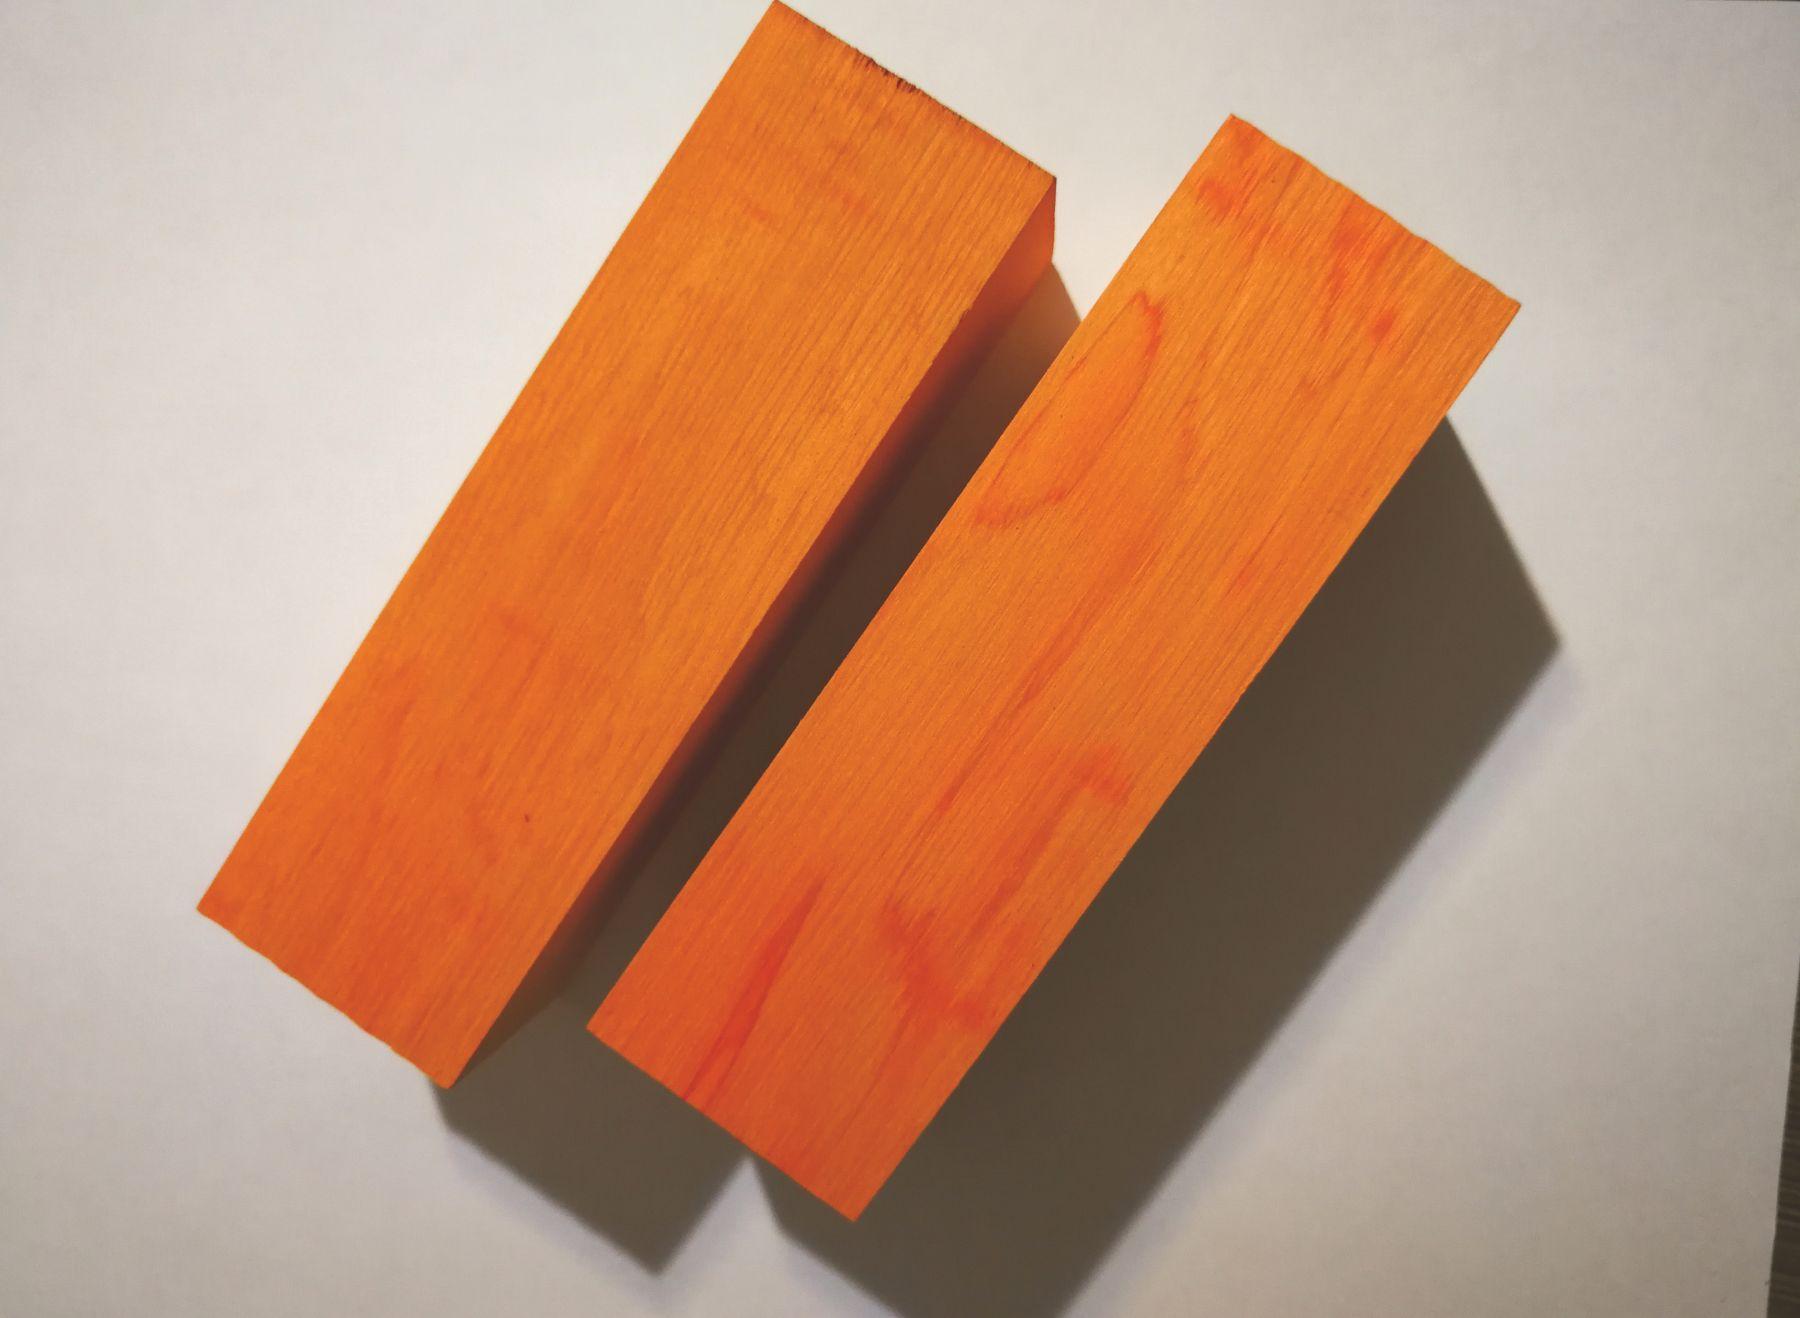 Оранжевый Граб плашки 5-7-10 мм на выбор (цена за 1 шт)